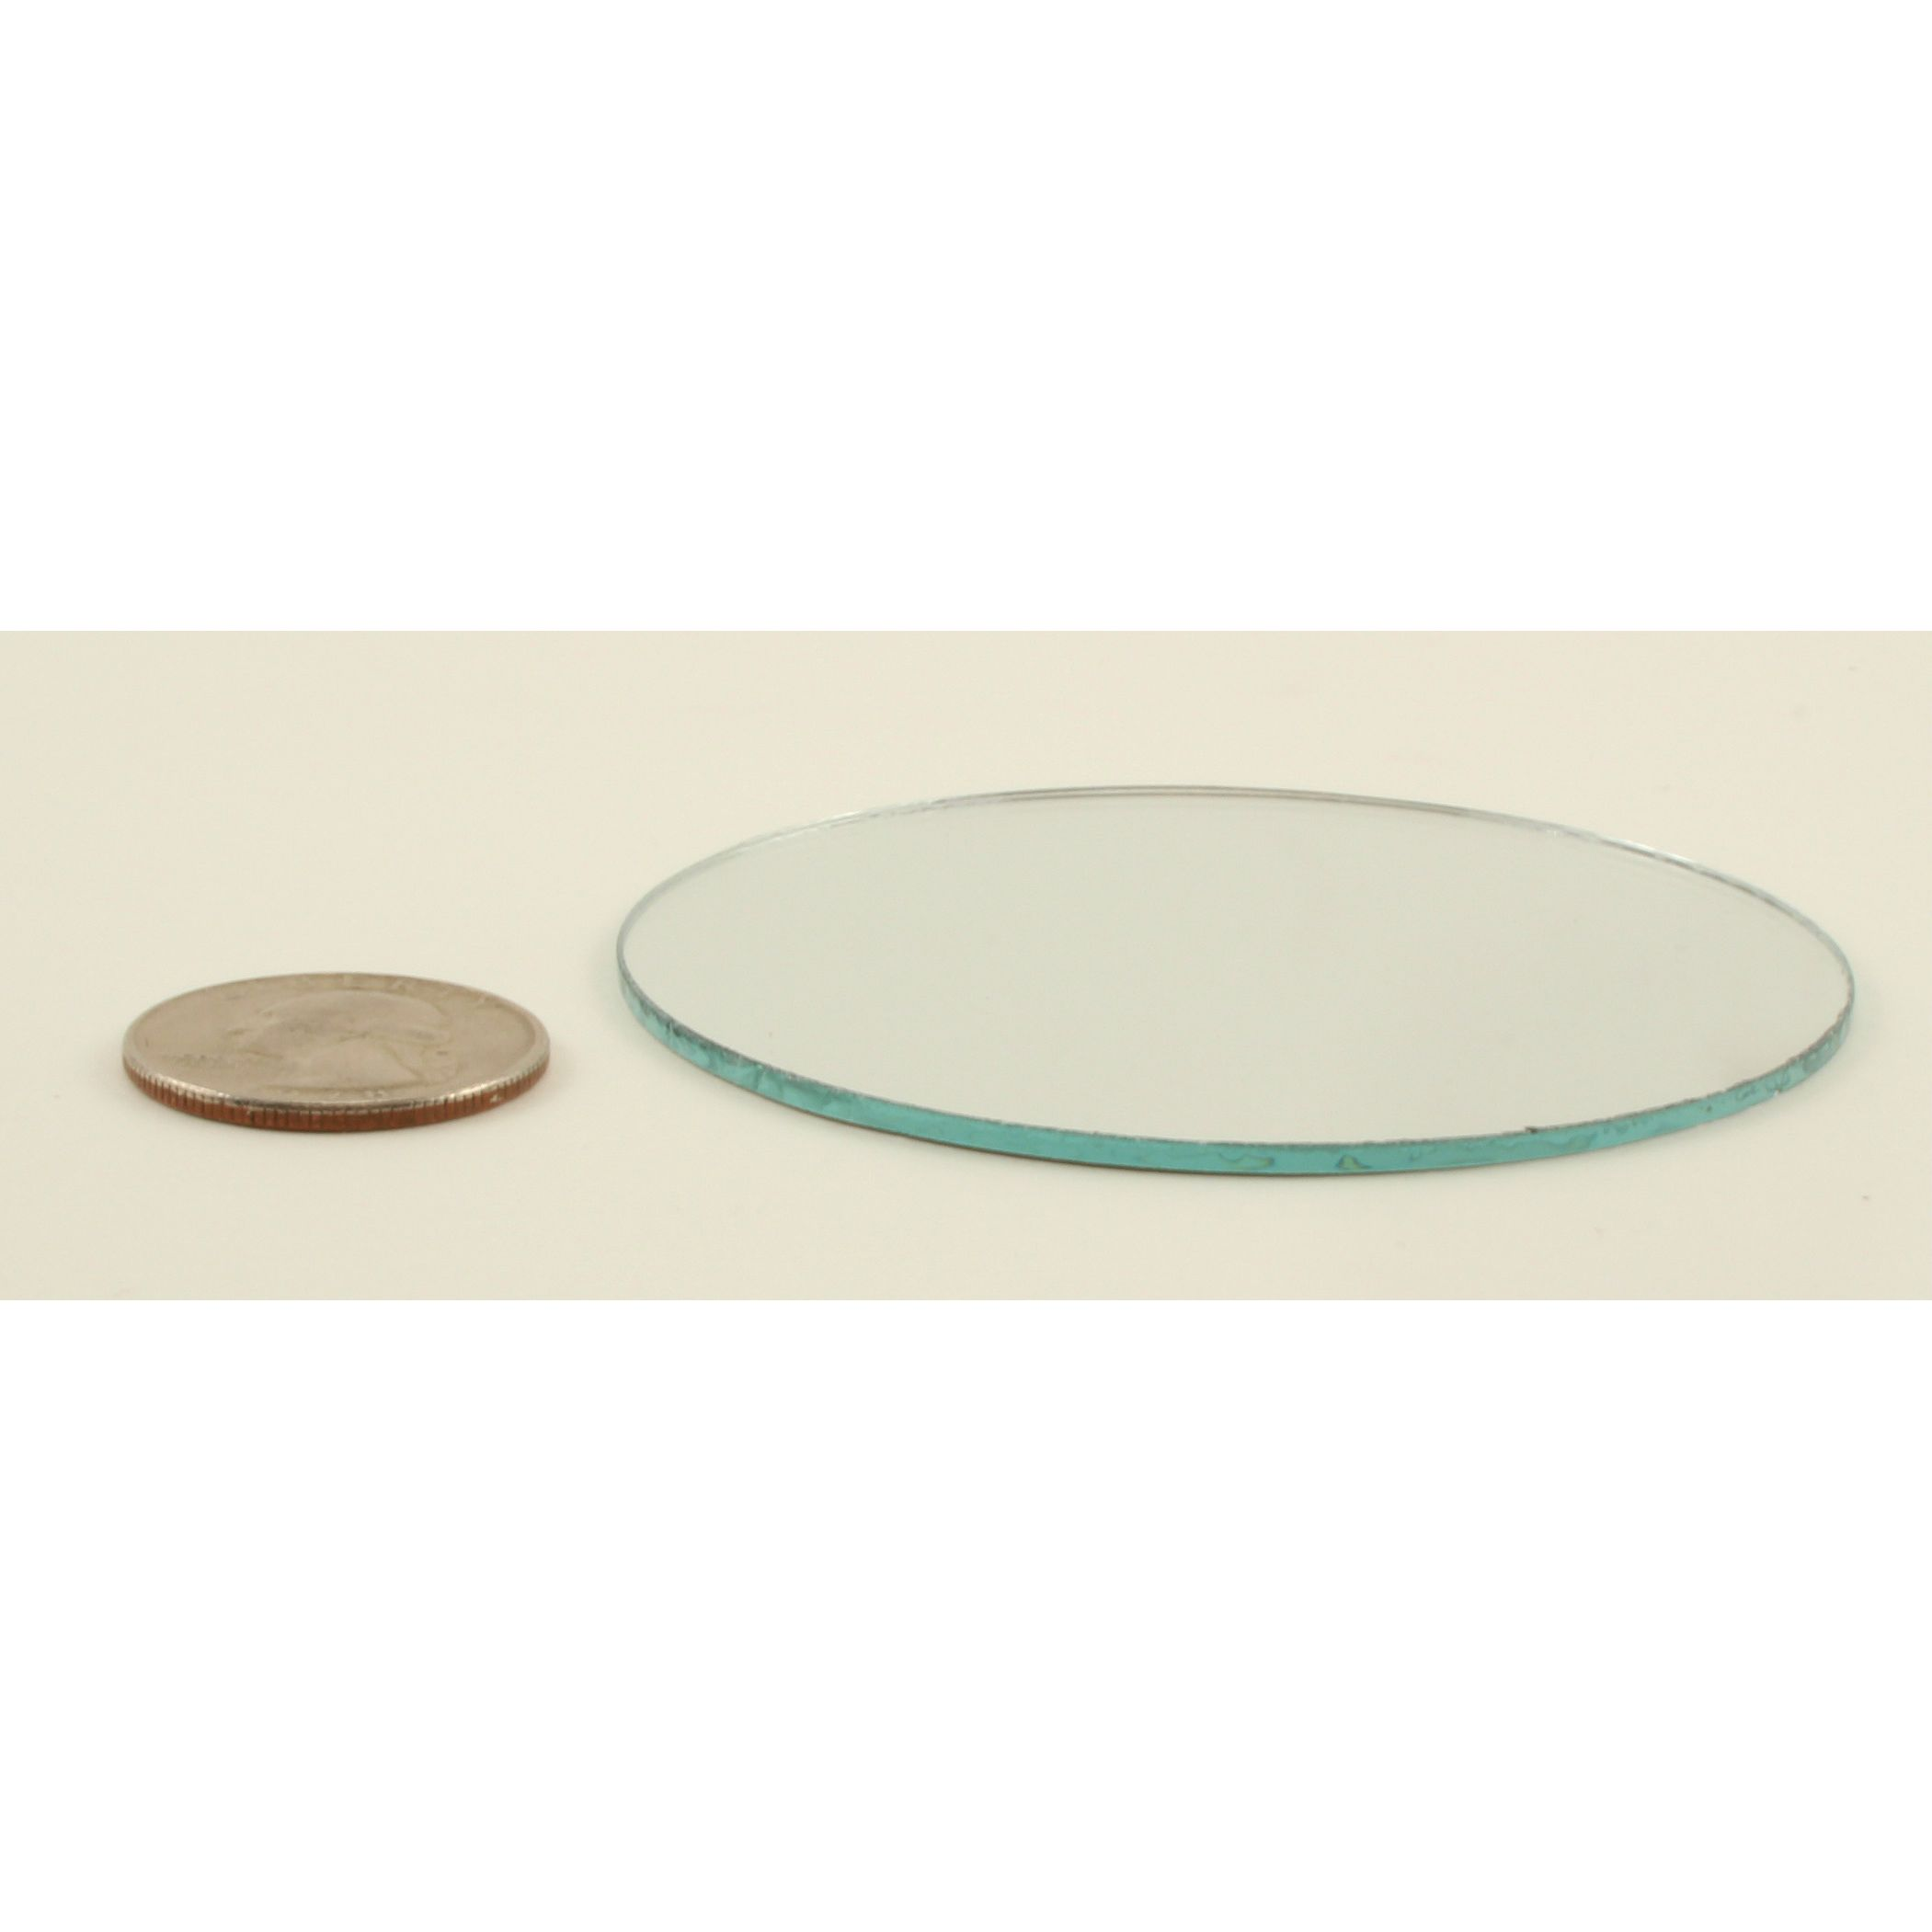 Small Mirror Pieces: 3 Inch Glass Small Round Mirrors Bulk 100 Pieces Mirror